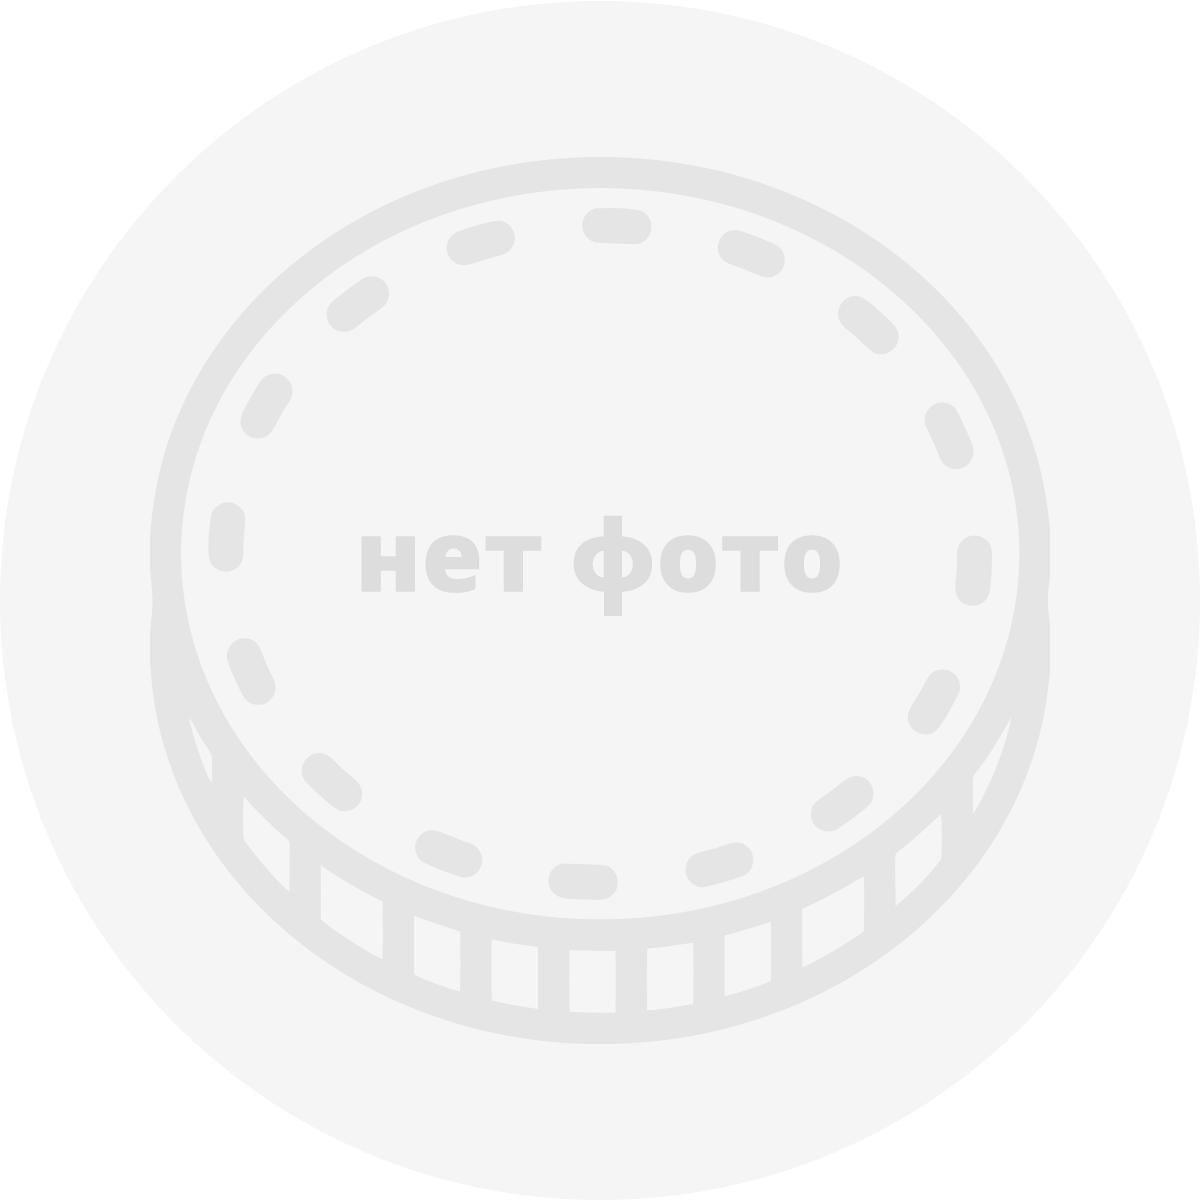 Нотгельды Германии, 1 марка